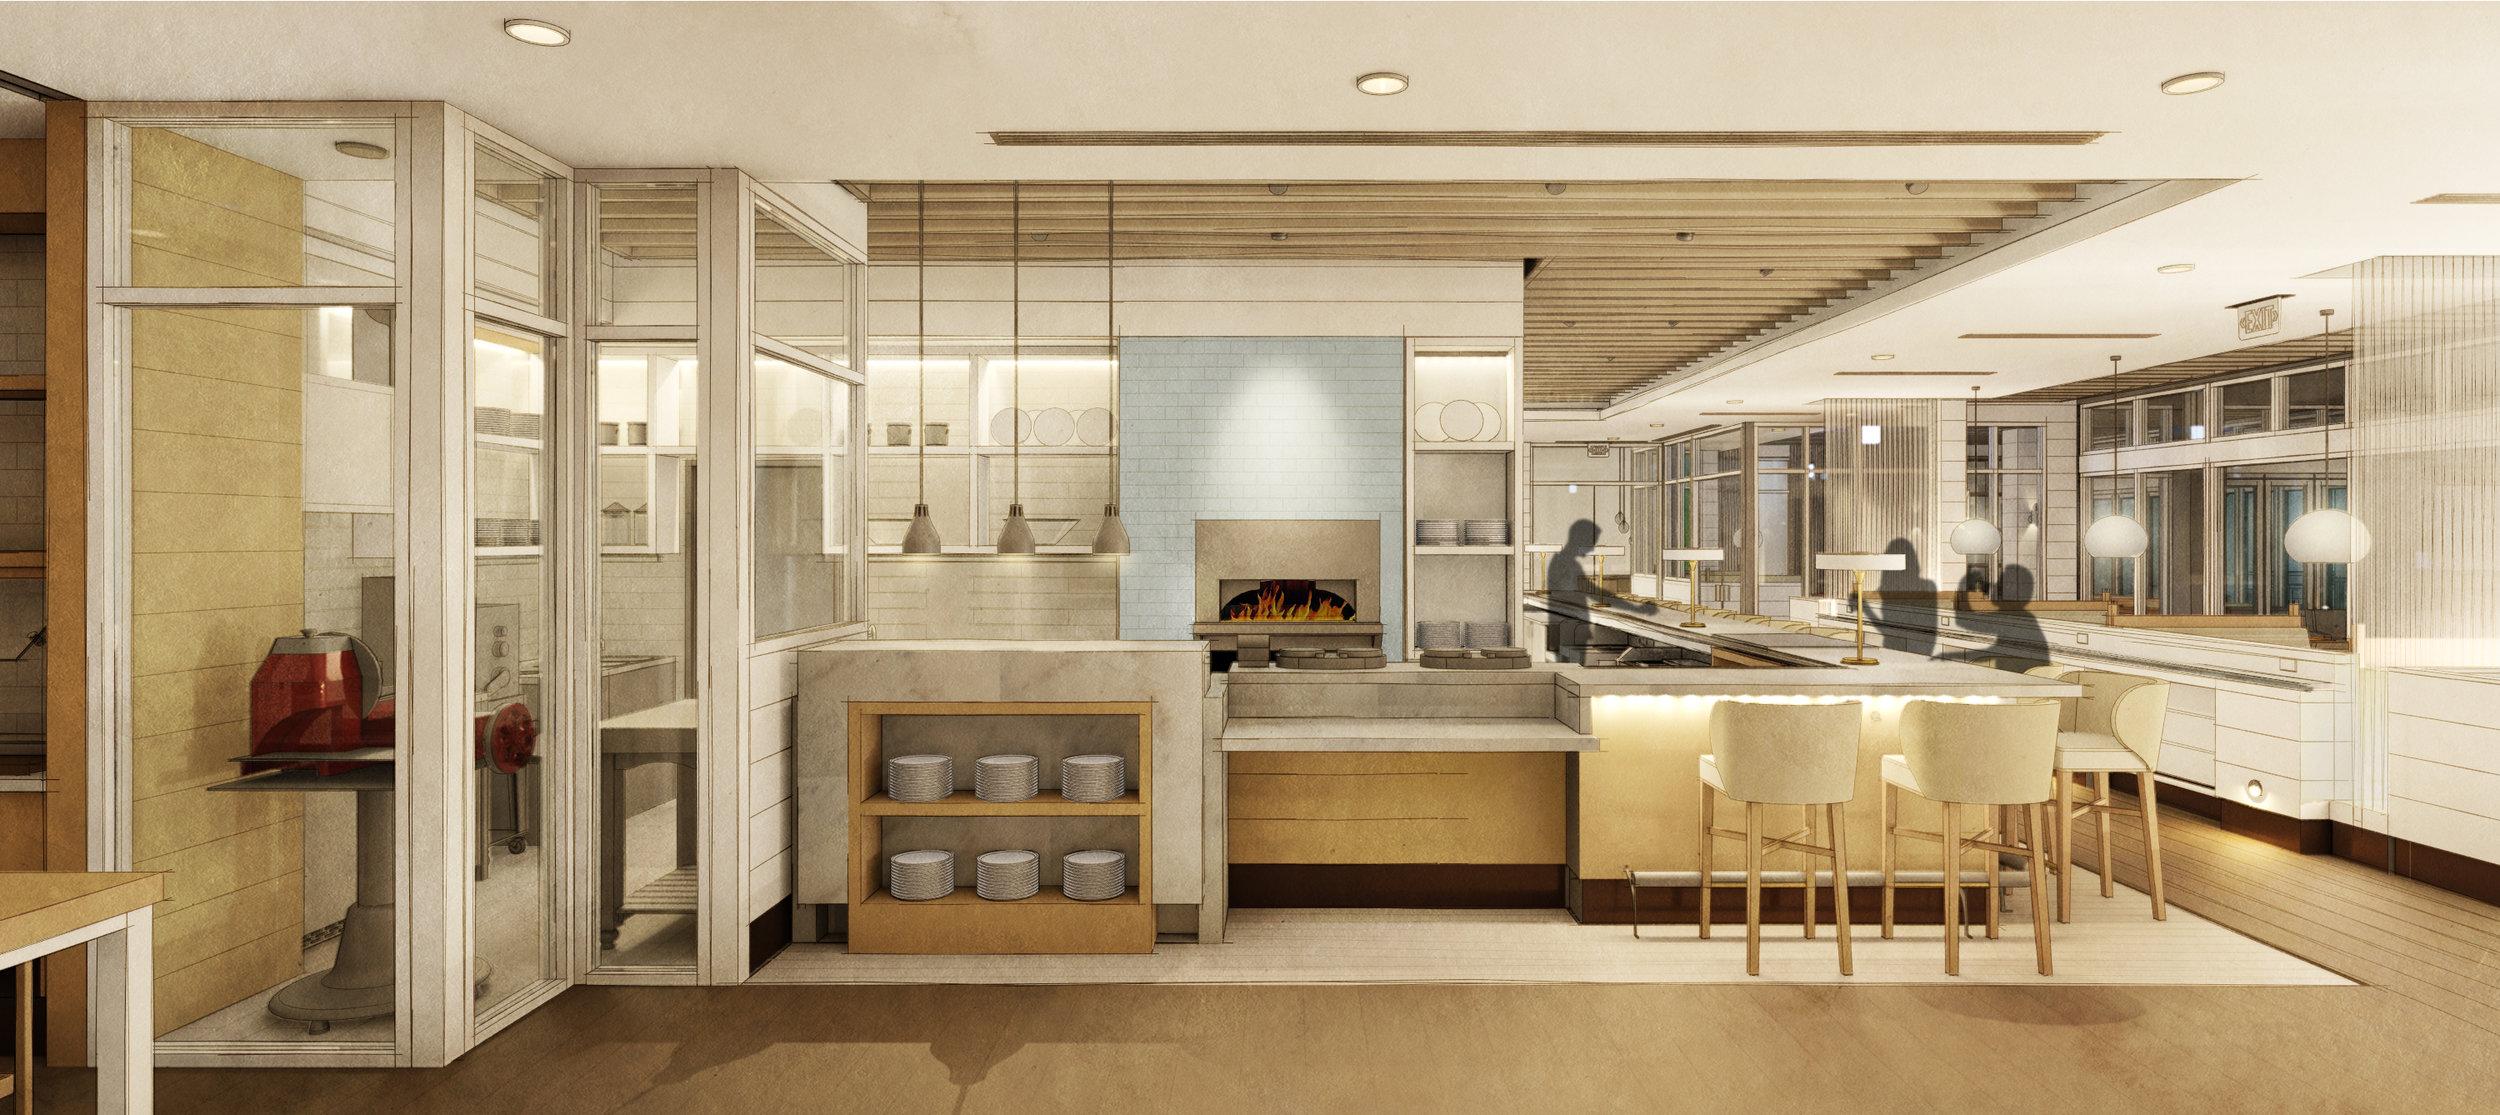 Chef's Bar - View 1 Render.jpg